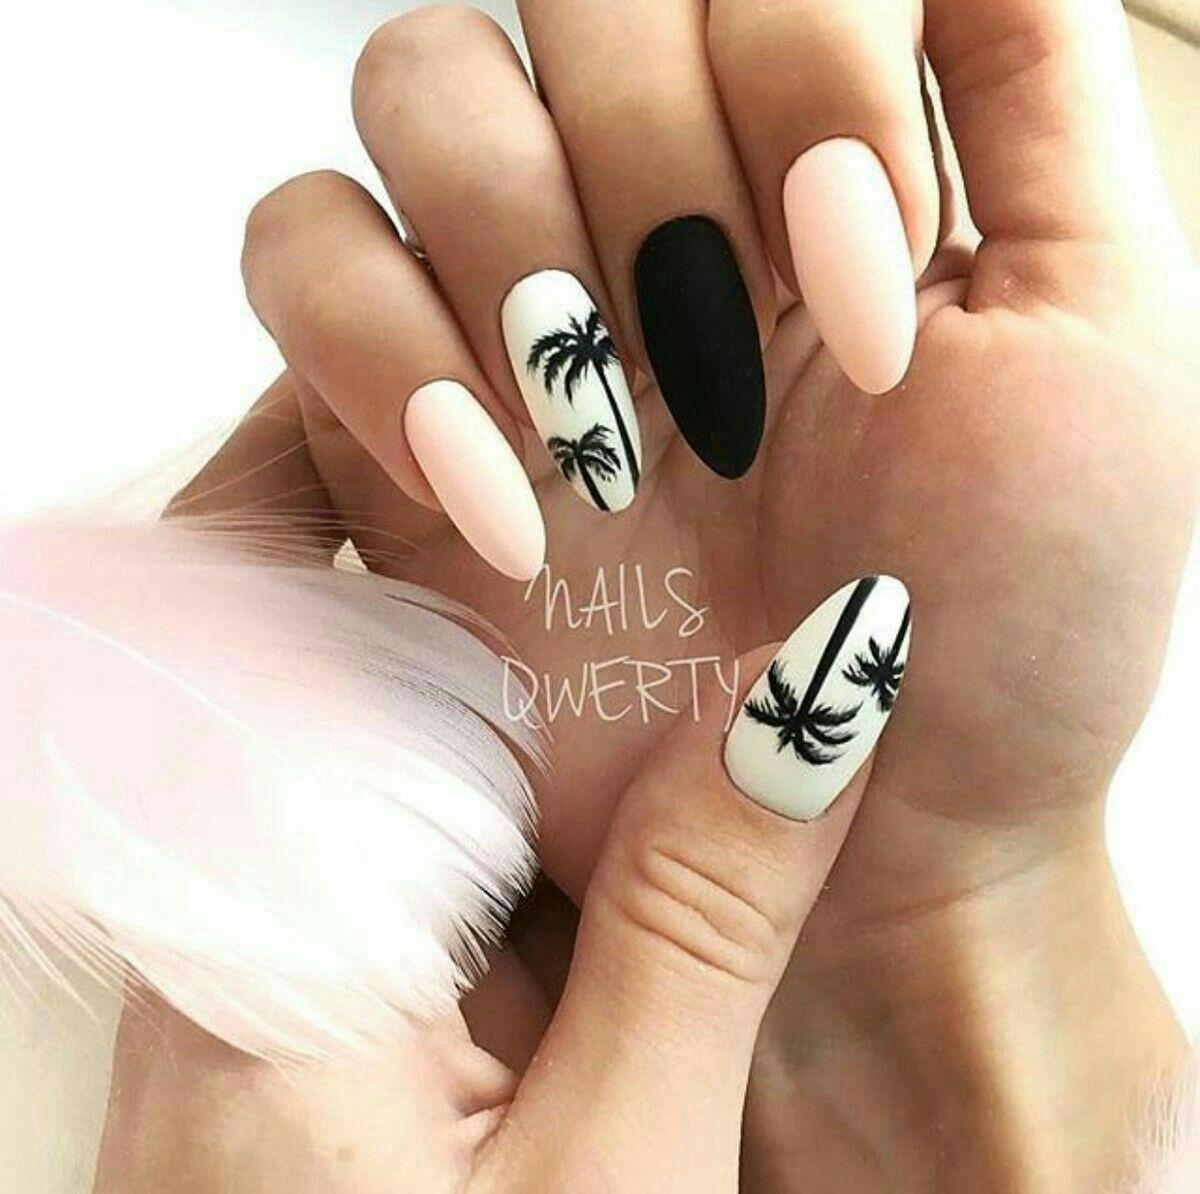 hottest beach nail ideas designs for summer cool nails